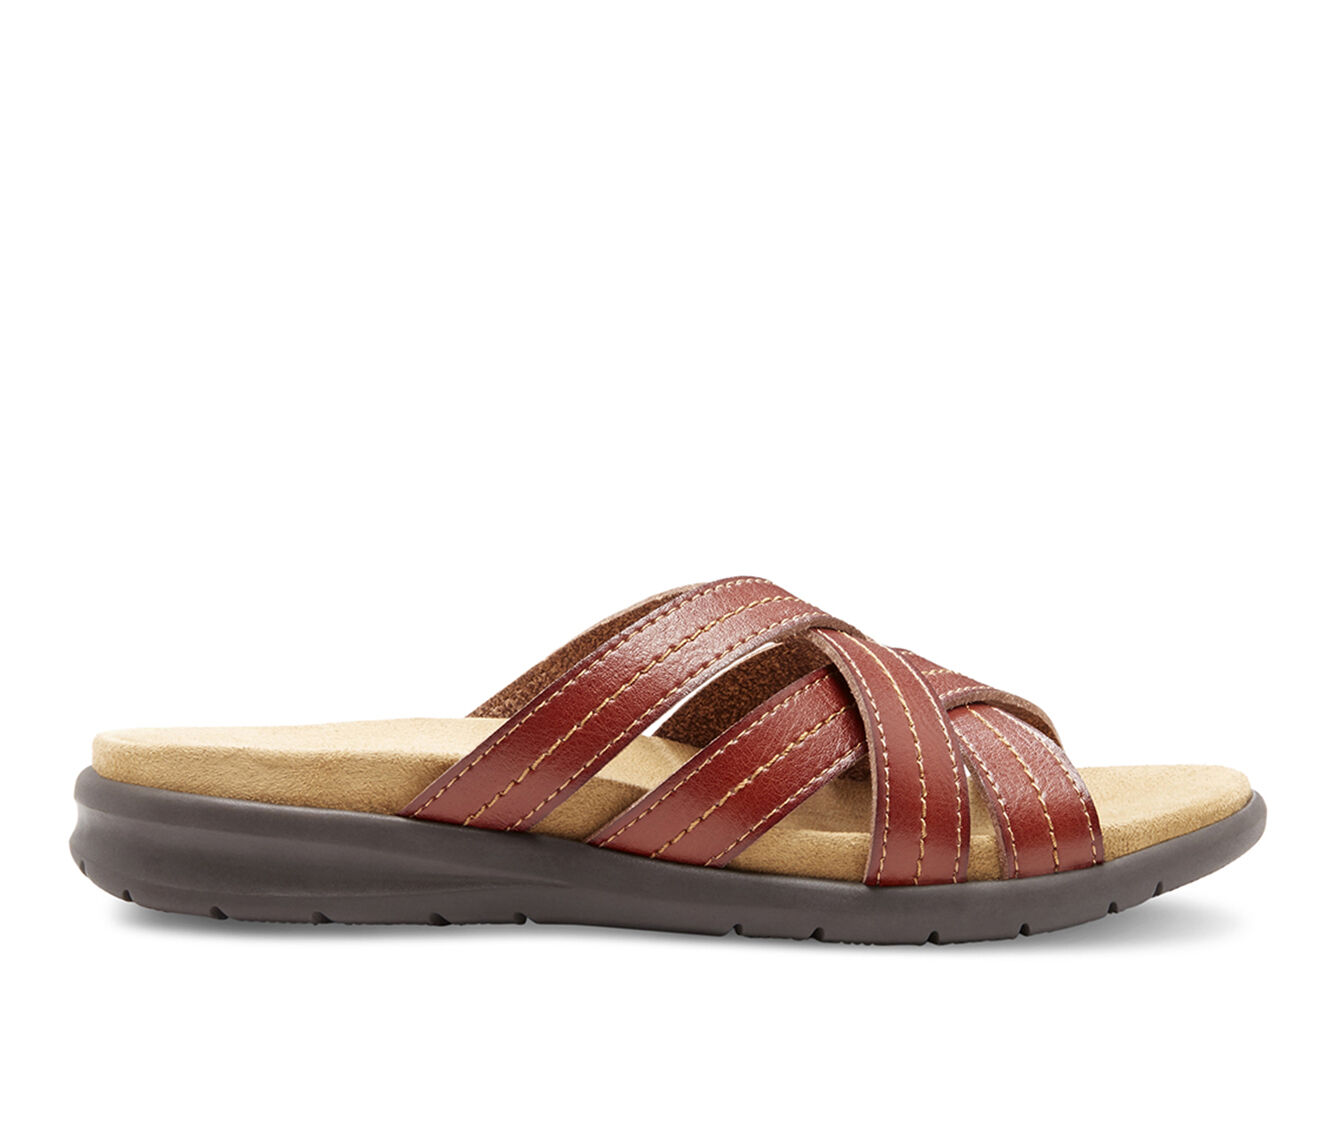 uk shoes_kd7109